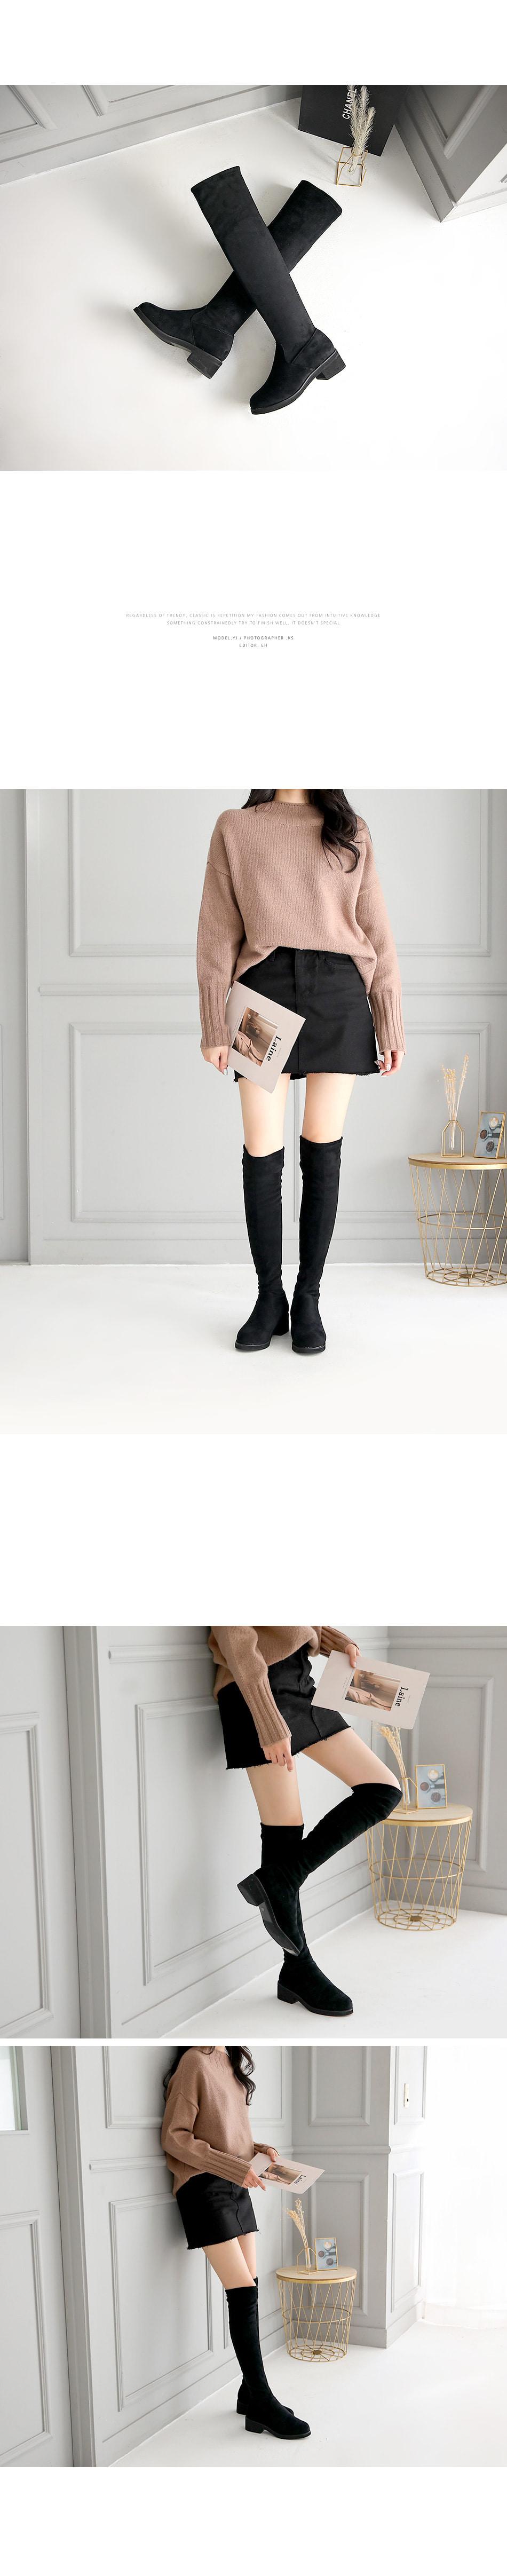 Dkeran Sox Knee High Boots 4cm